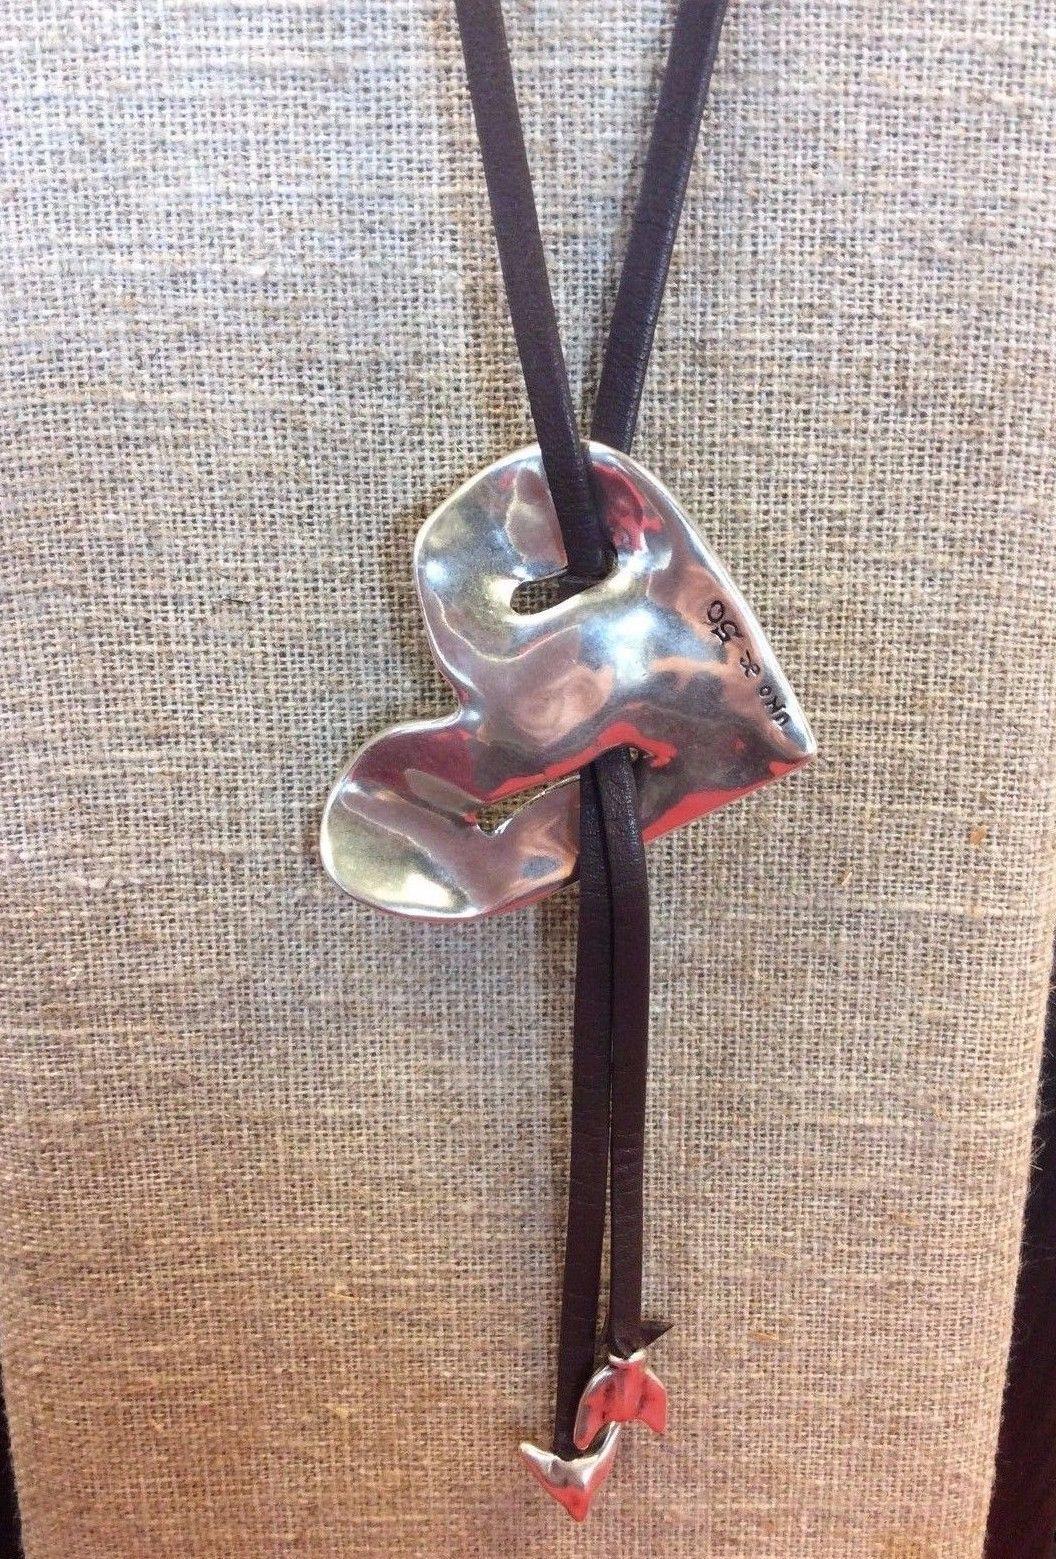 New uno de 50 bonnie clyde heart leather necklace w packaging new uno de 50 bonnie clyde heart leather necklace w packaging col0944marmtl0u mozeypictures Images